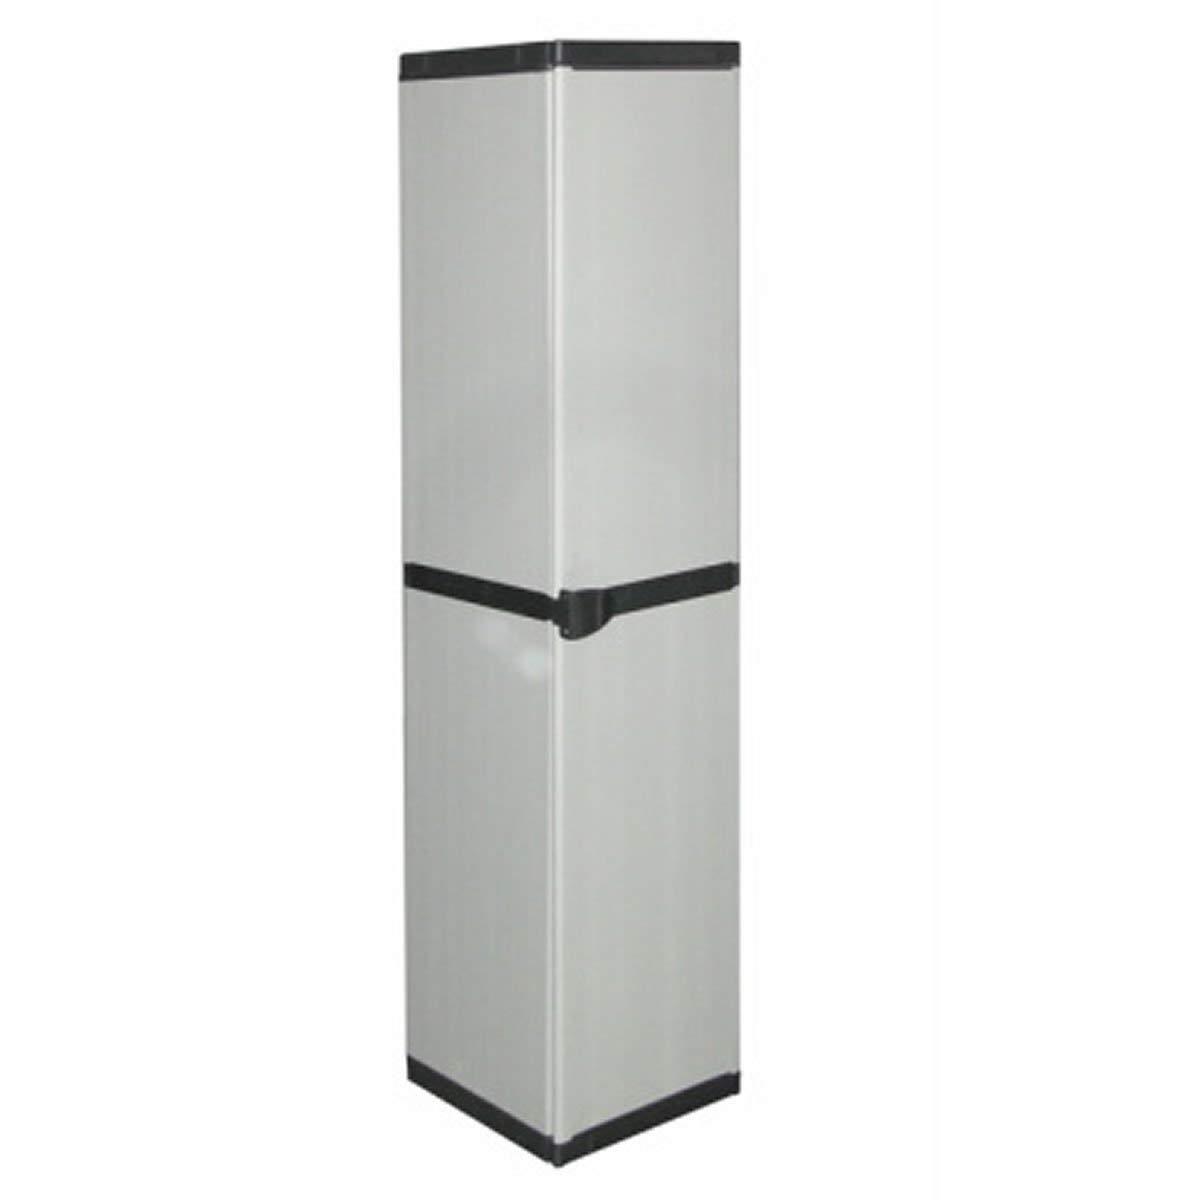 34 x 39.5 x 85 cm Grey Mongardi 7813C04 Modular Furniture Cabinet